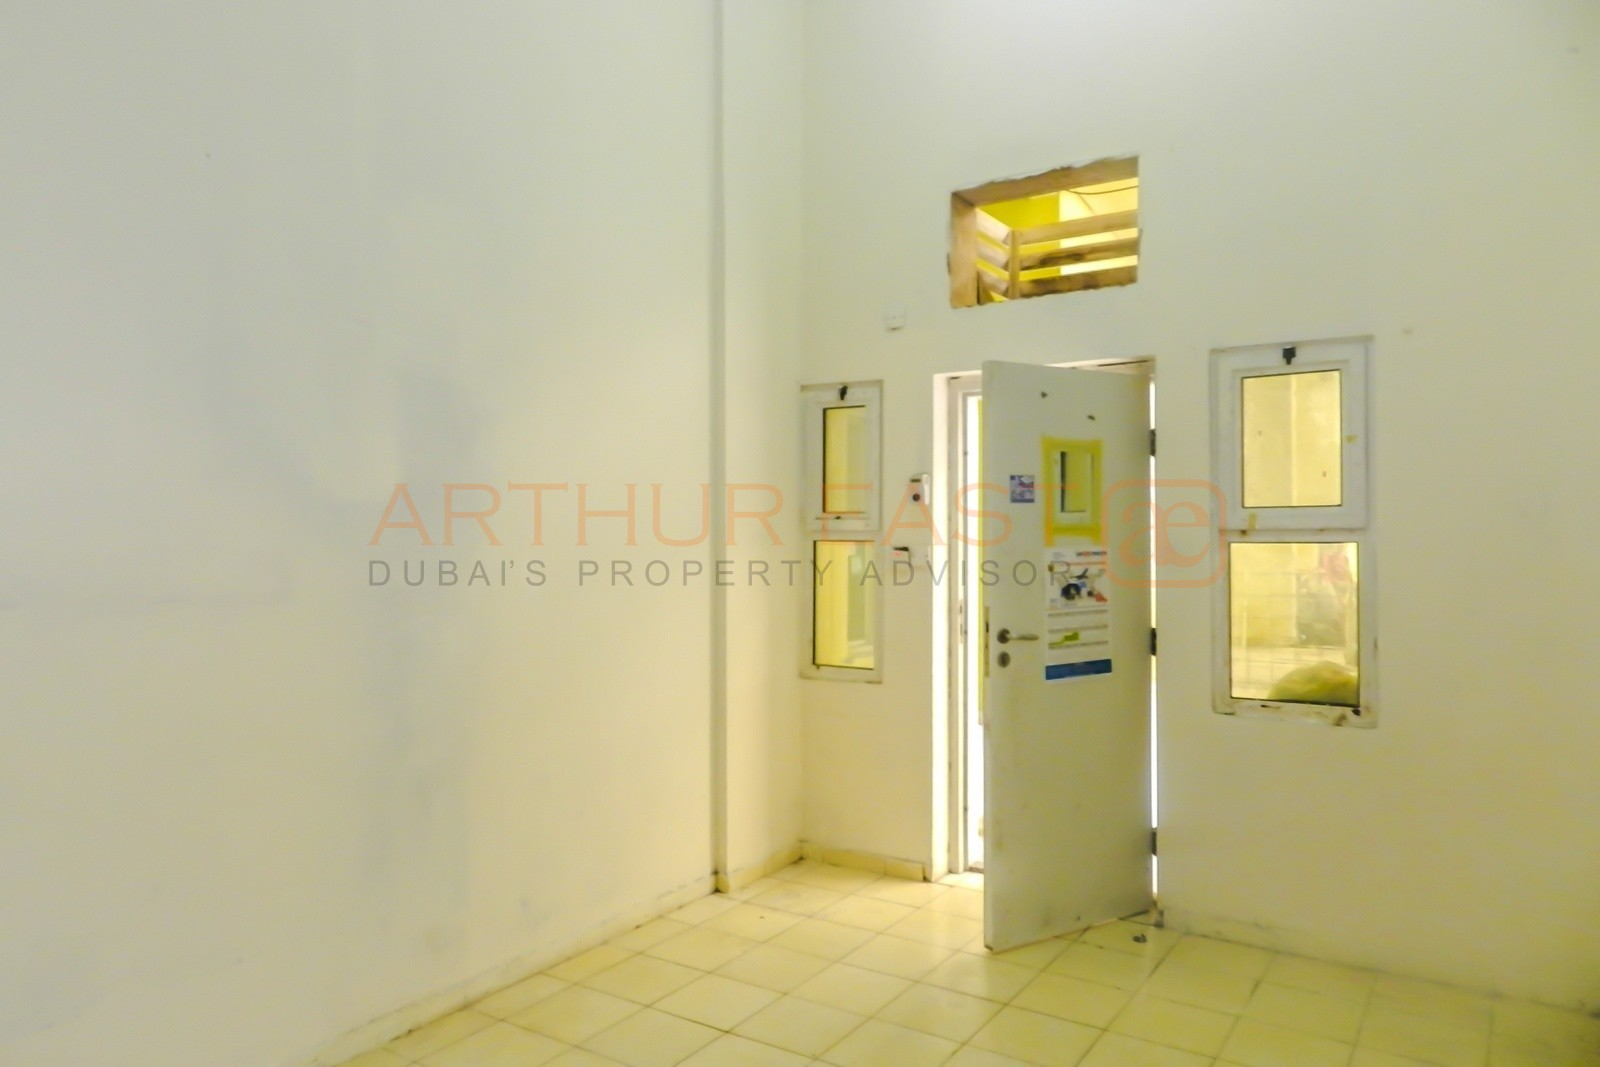 aed-3600month-al-quoz-labor-rooms-6-person-capacity